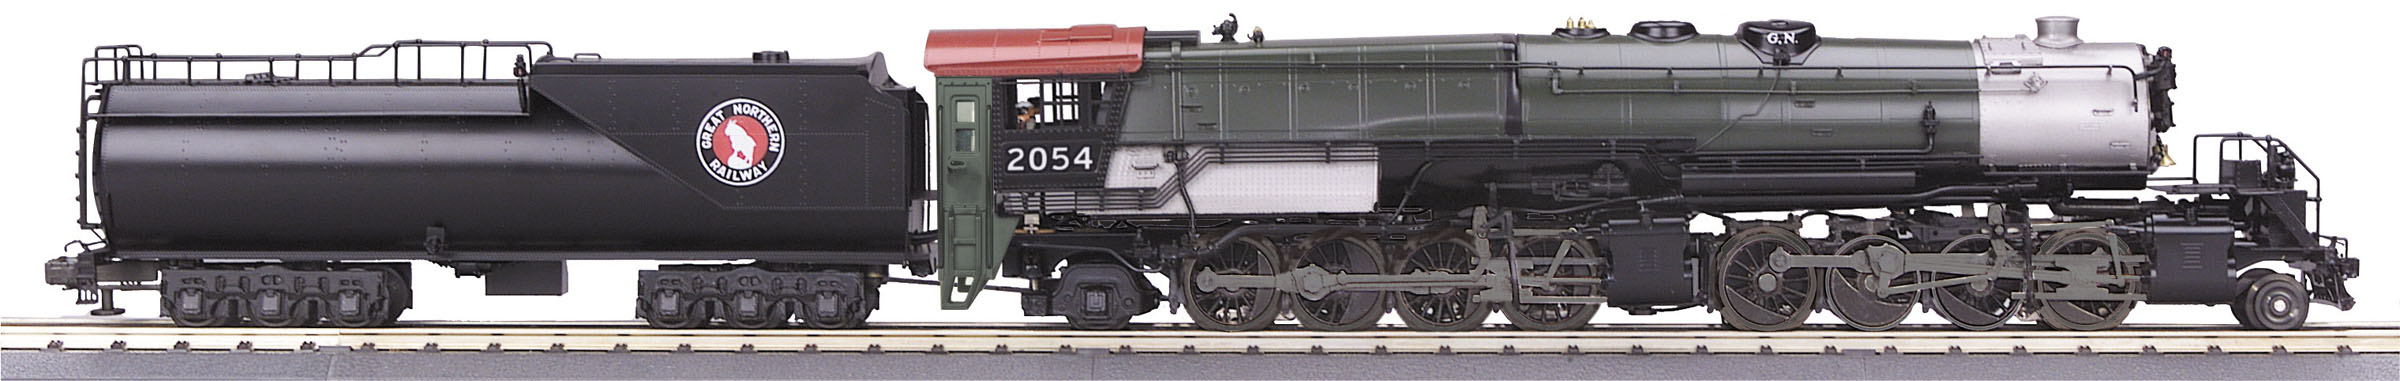 20 3054 1 mth electric trains bachmann trains mth trains wiring diagrams #22